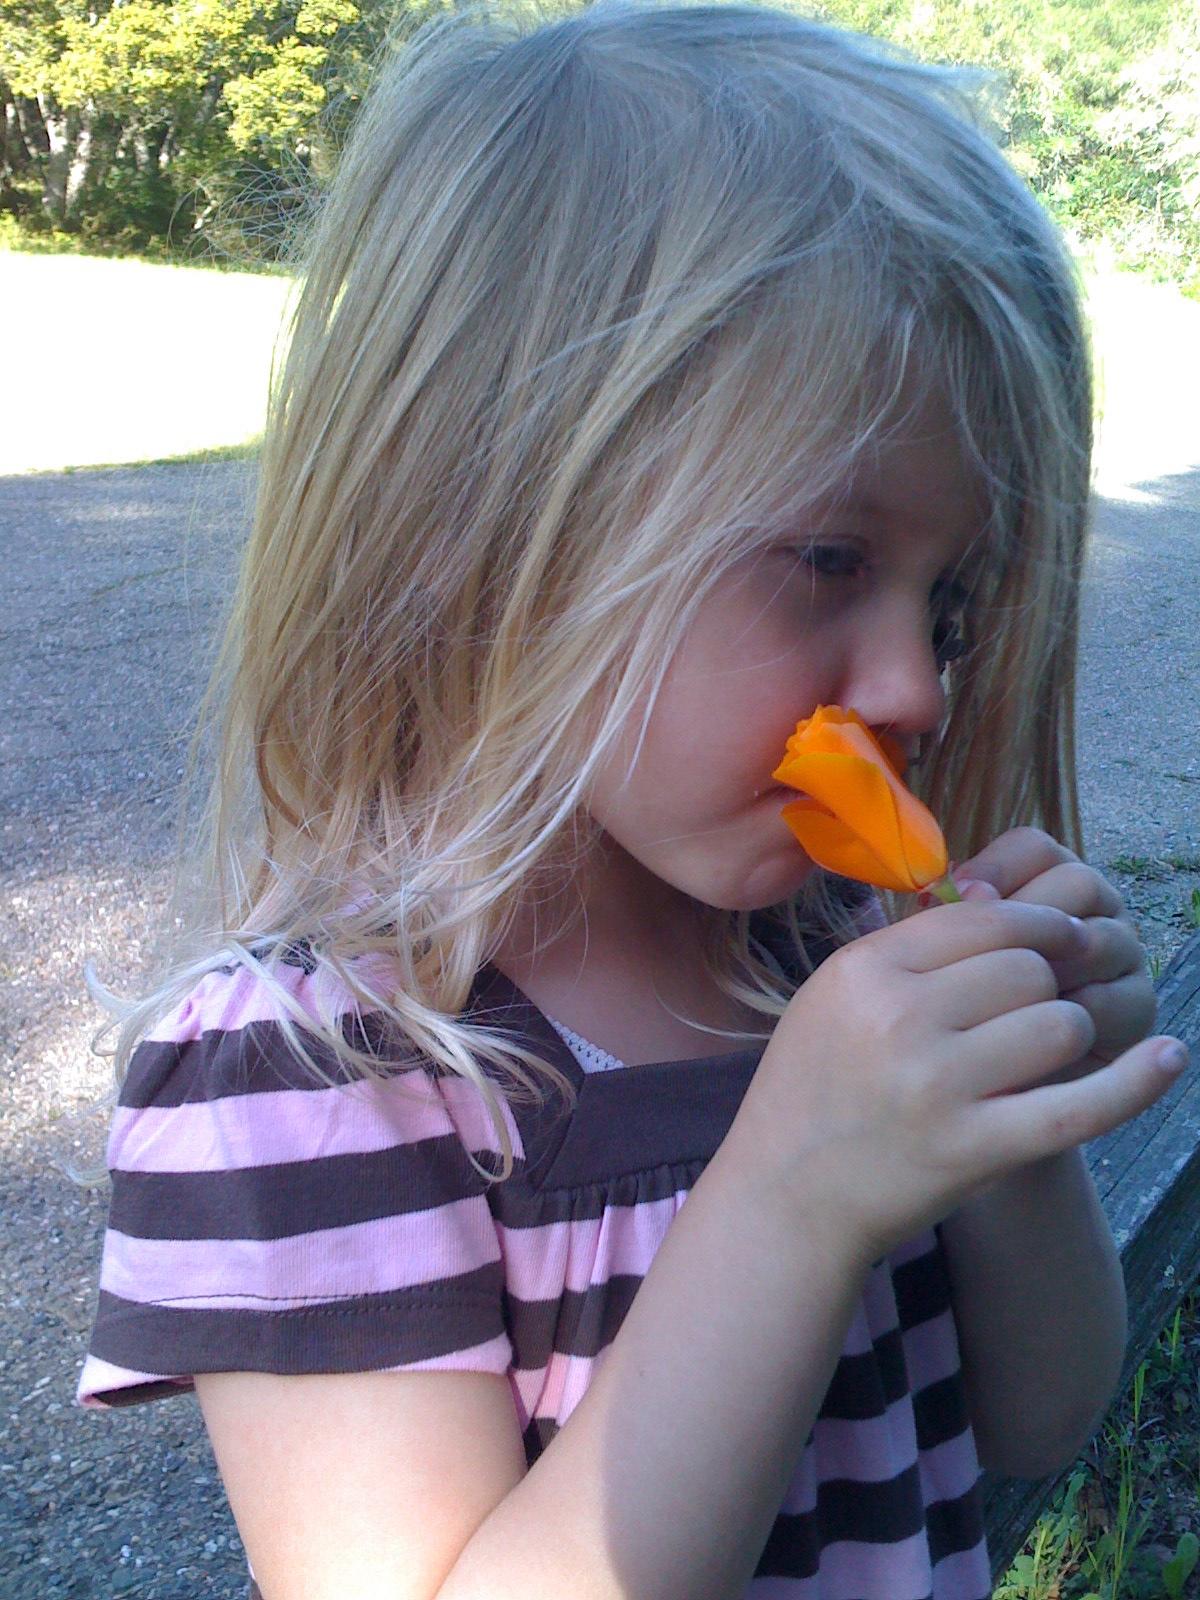 Enjoying the wildflowers